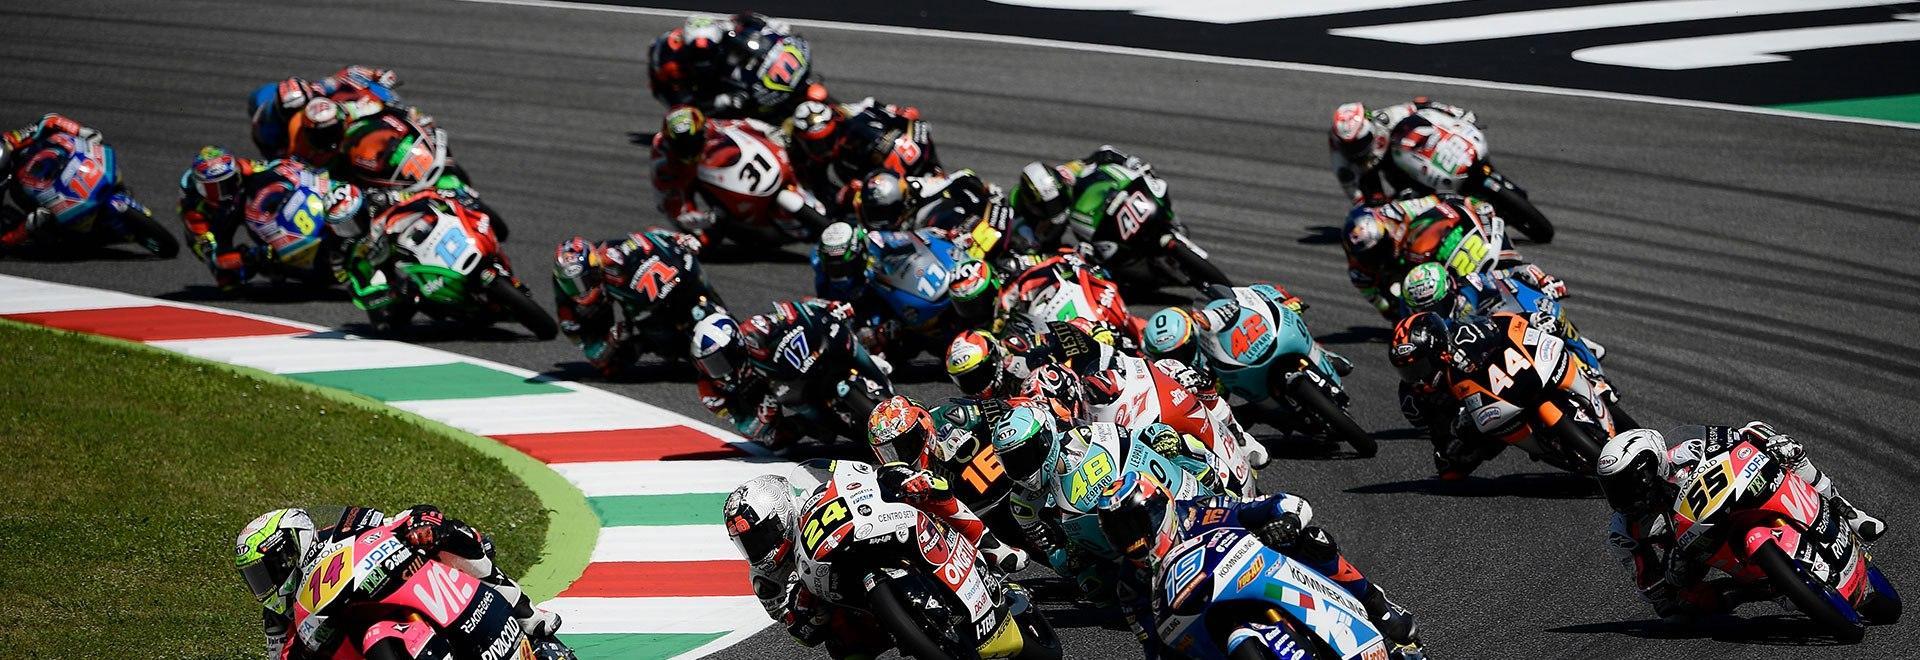 Moto3 Vallelunga. Race 2